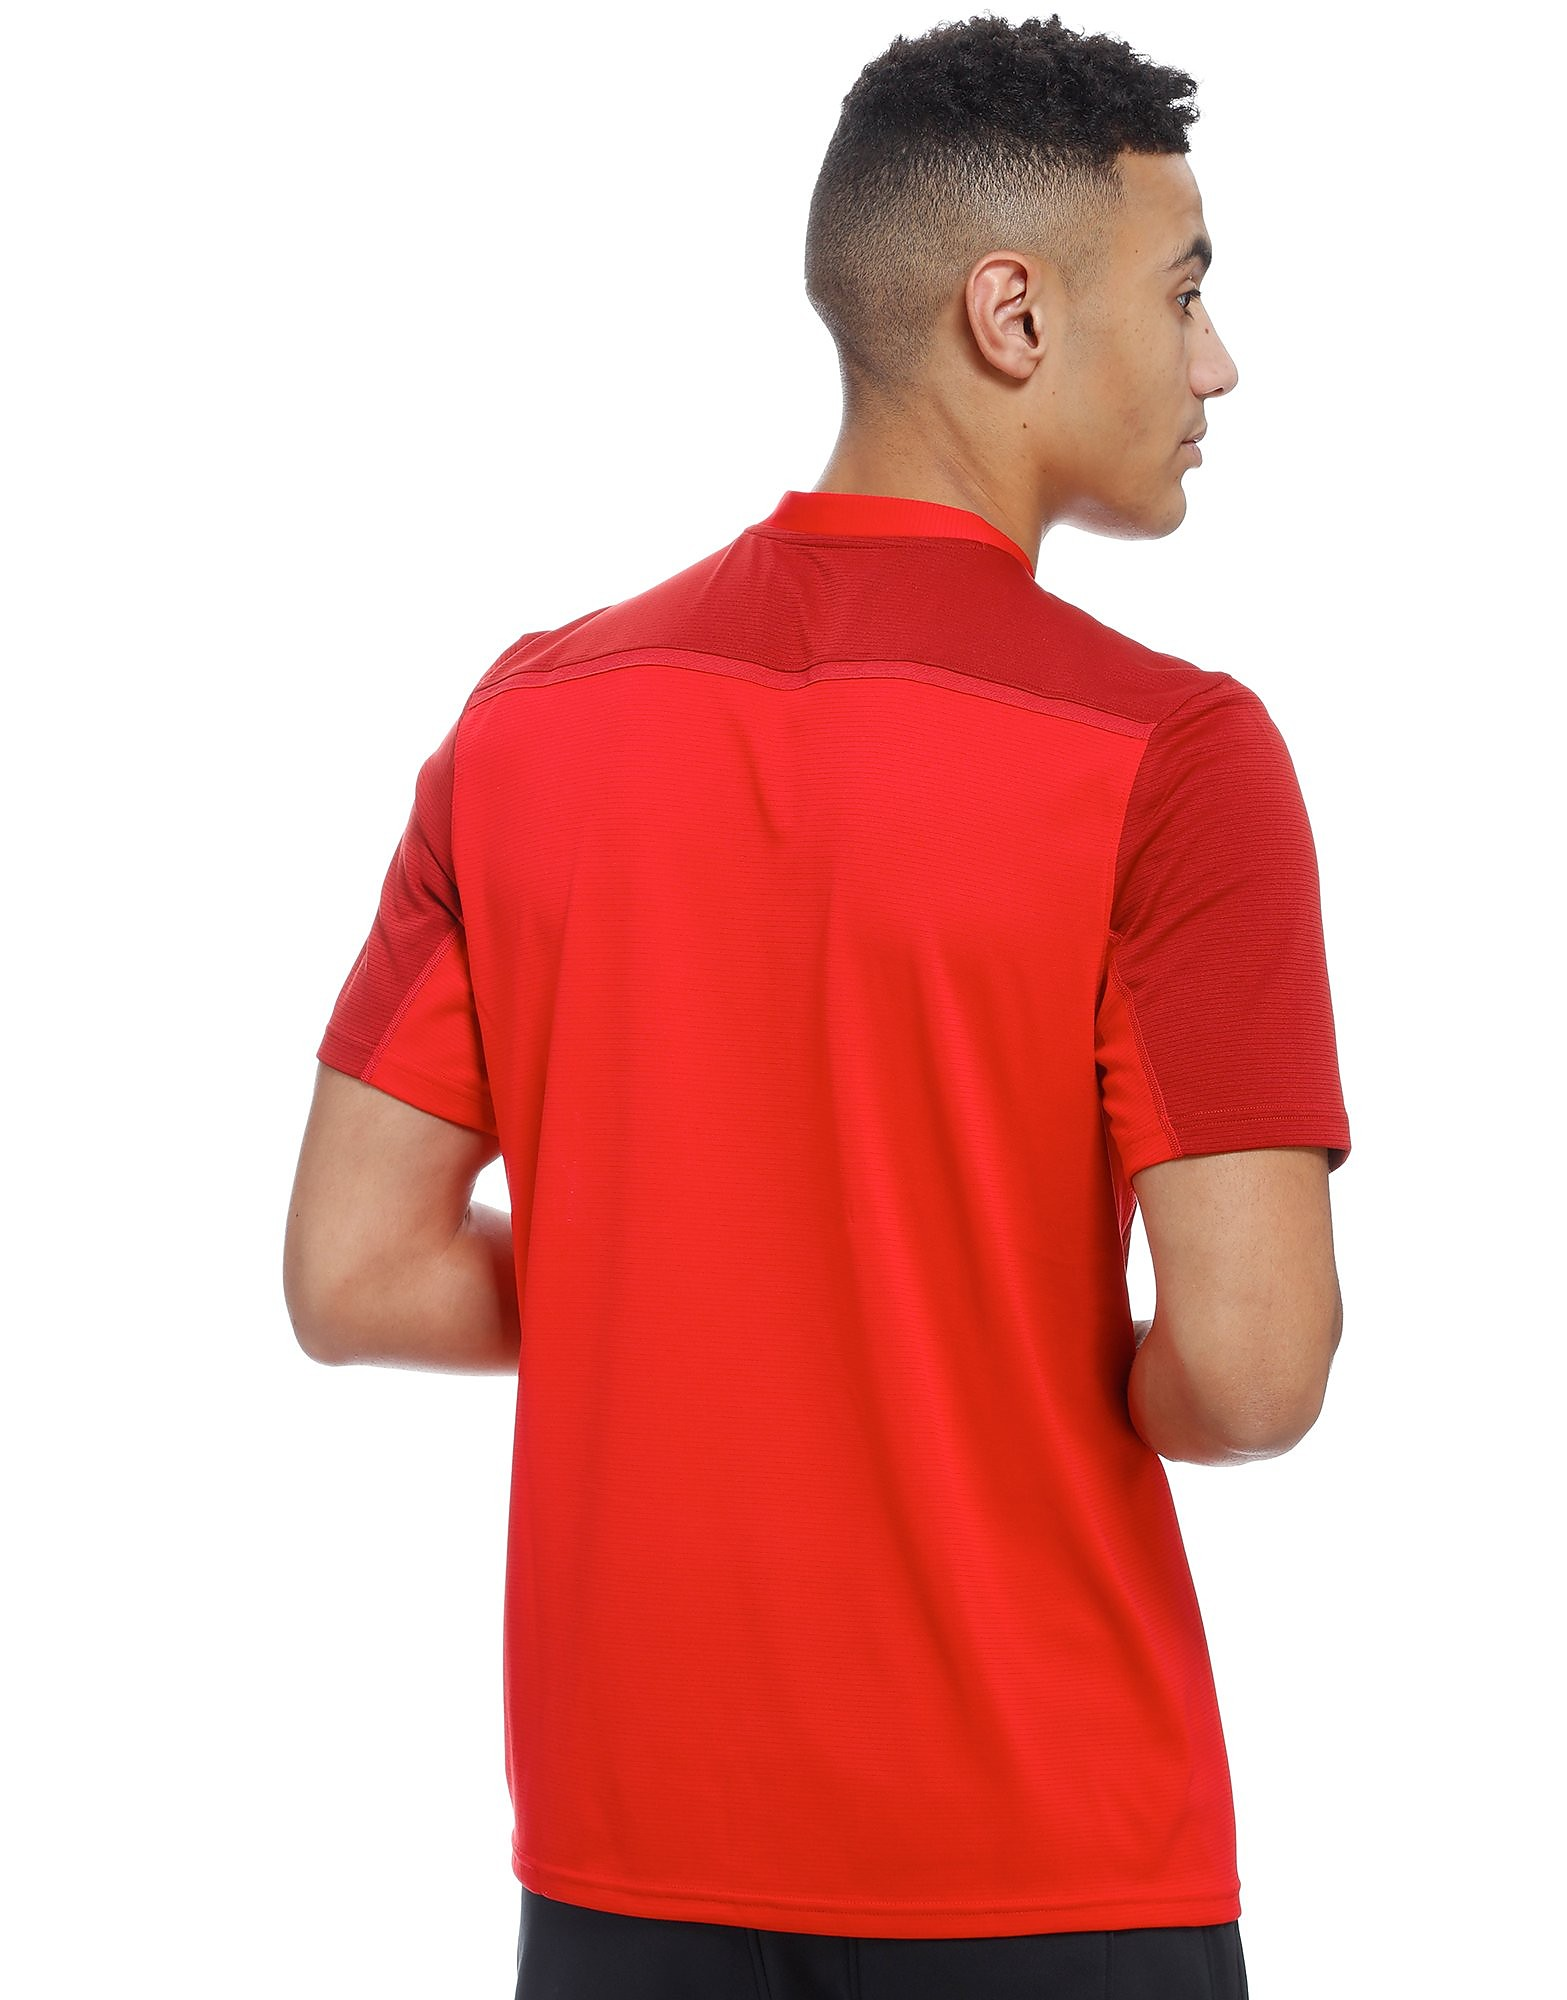 Under Armour Wales RU Training T-Shirt